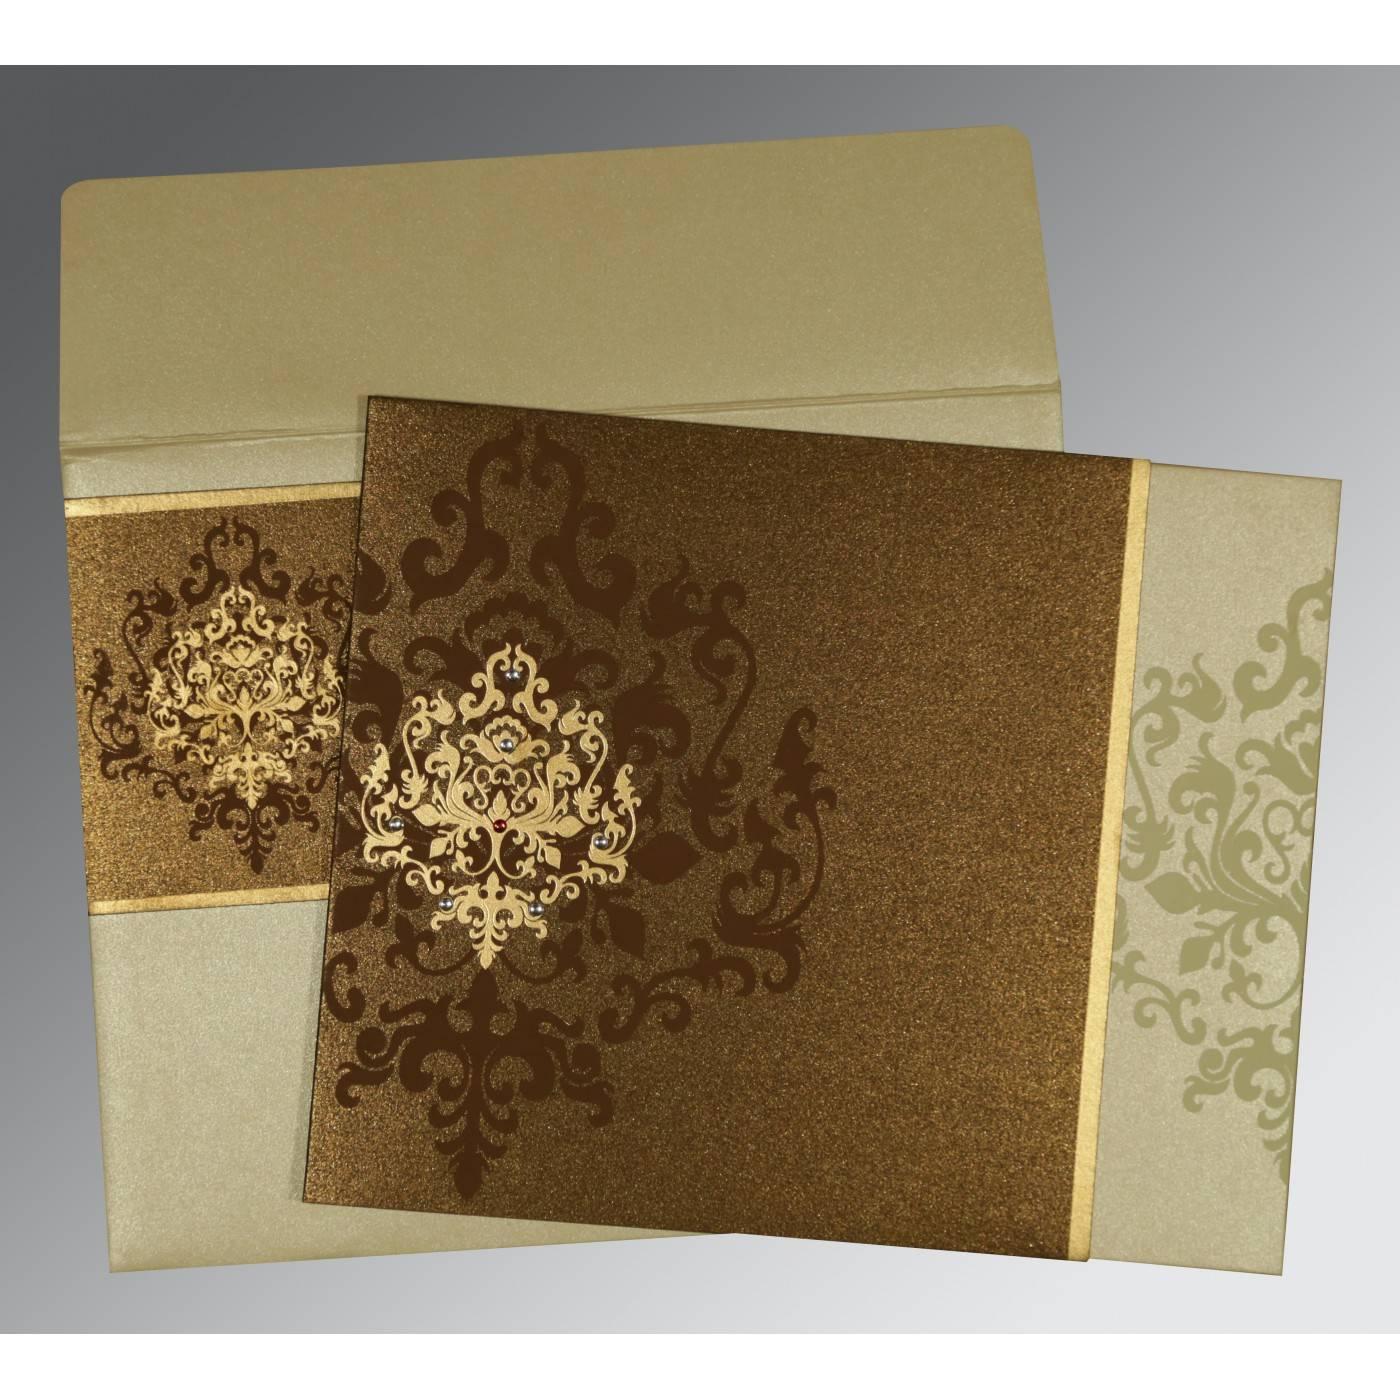 BROWN SHIMMERY DAMASK THEMED - SCREEN PRINTED WEDDING CARD : CG-8253A - IndianWeddingCards